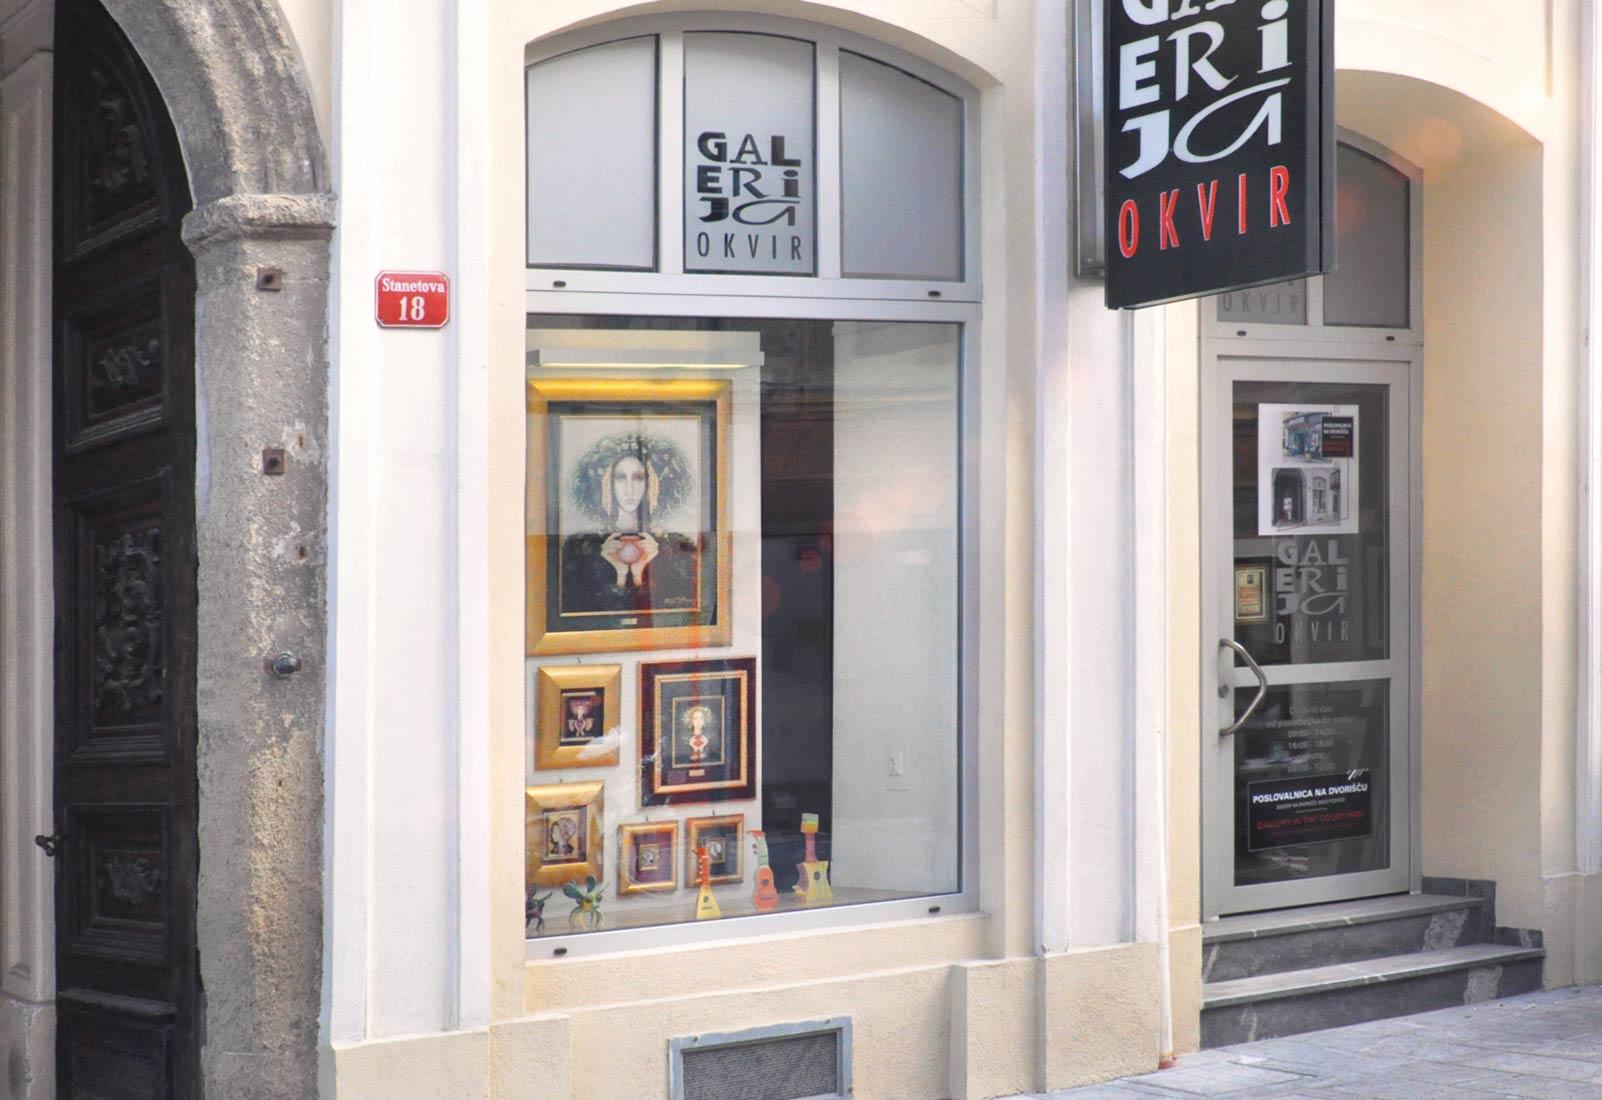 Galerija Okvir